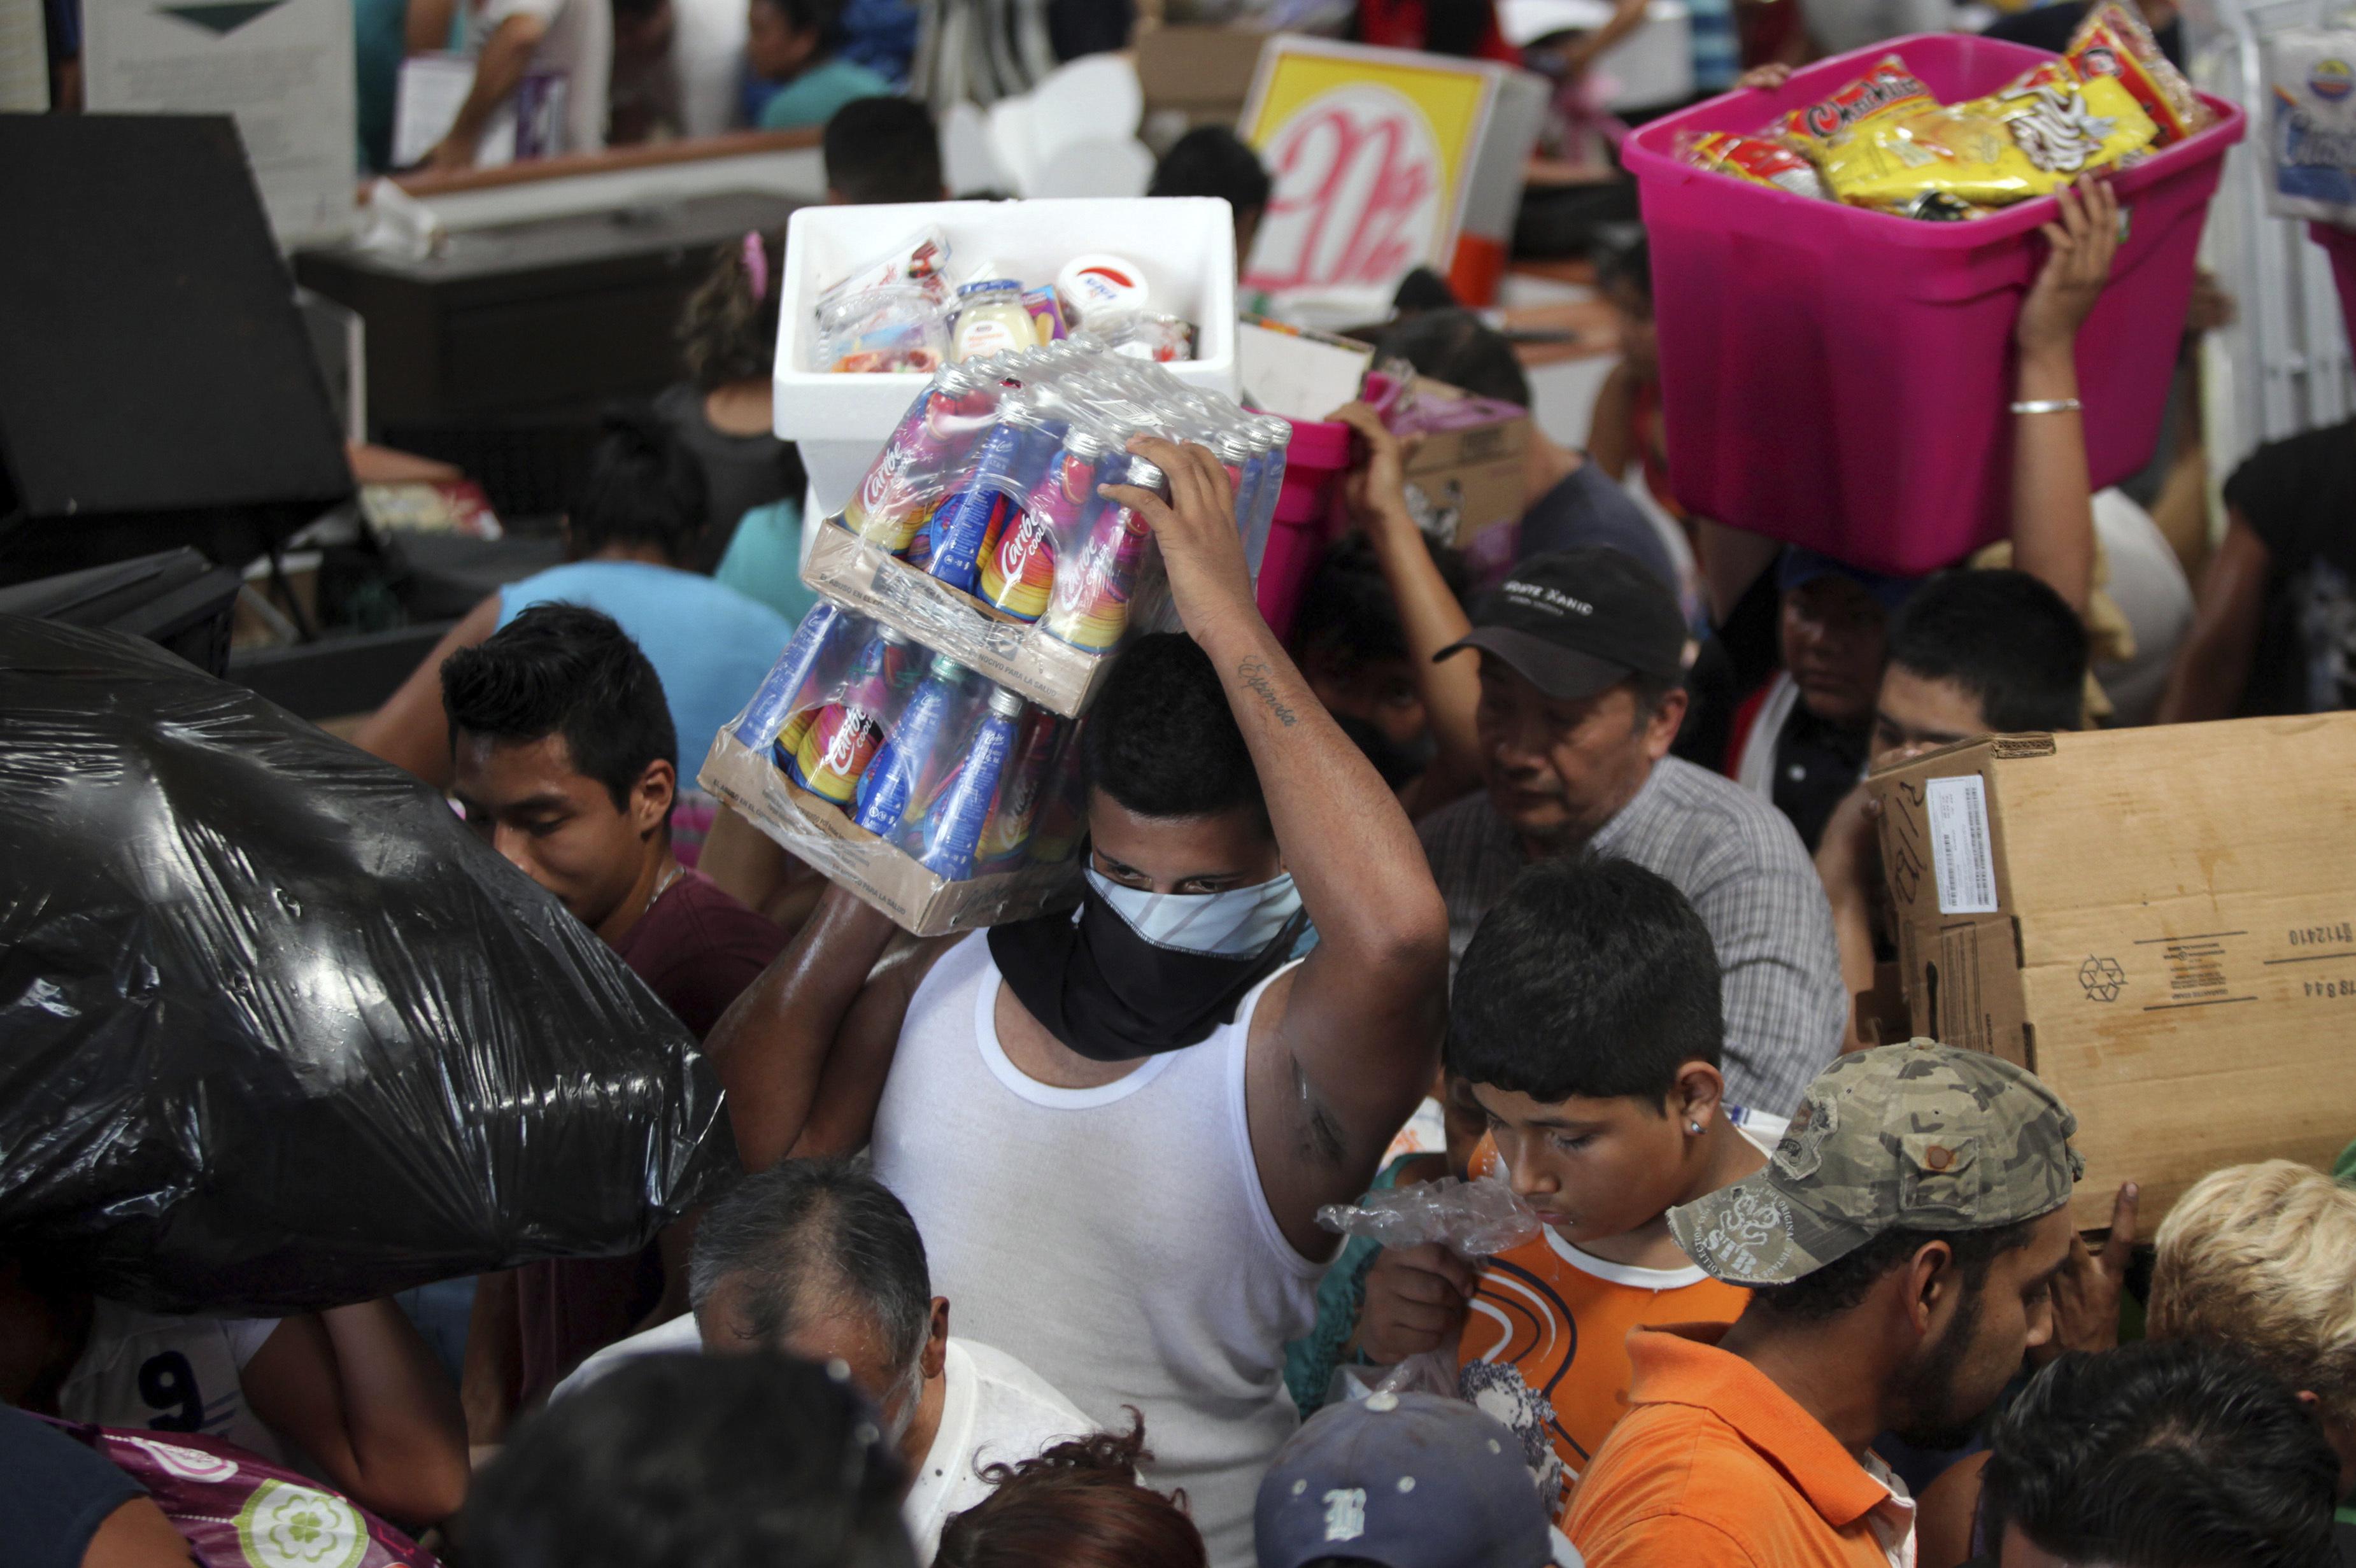 People ransack a store in Veracruz, Mexico on Jan. 5, 2017. (AP Photo/Felix Marquez)